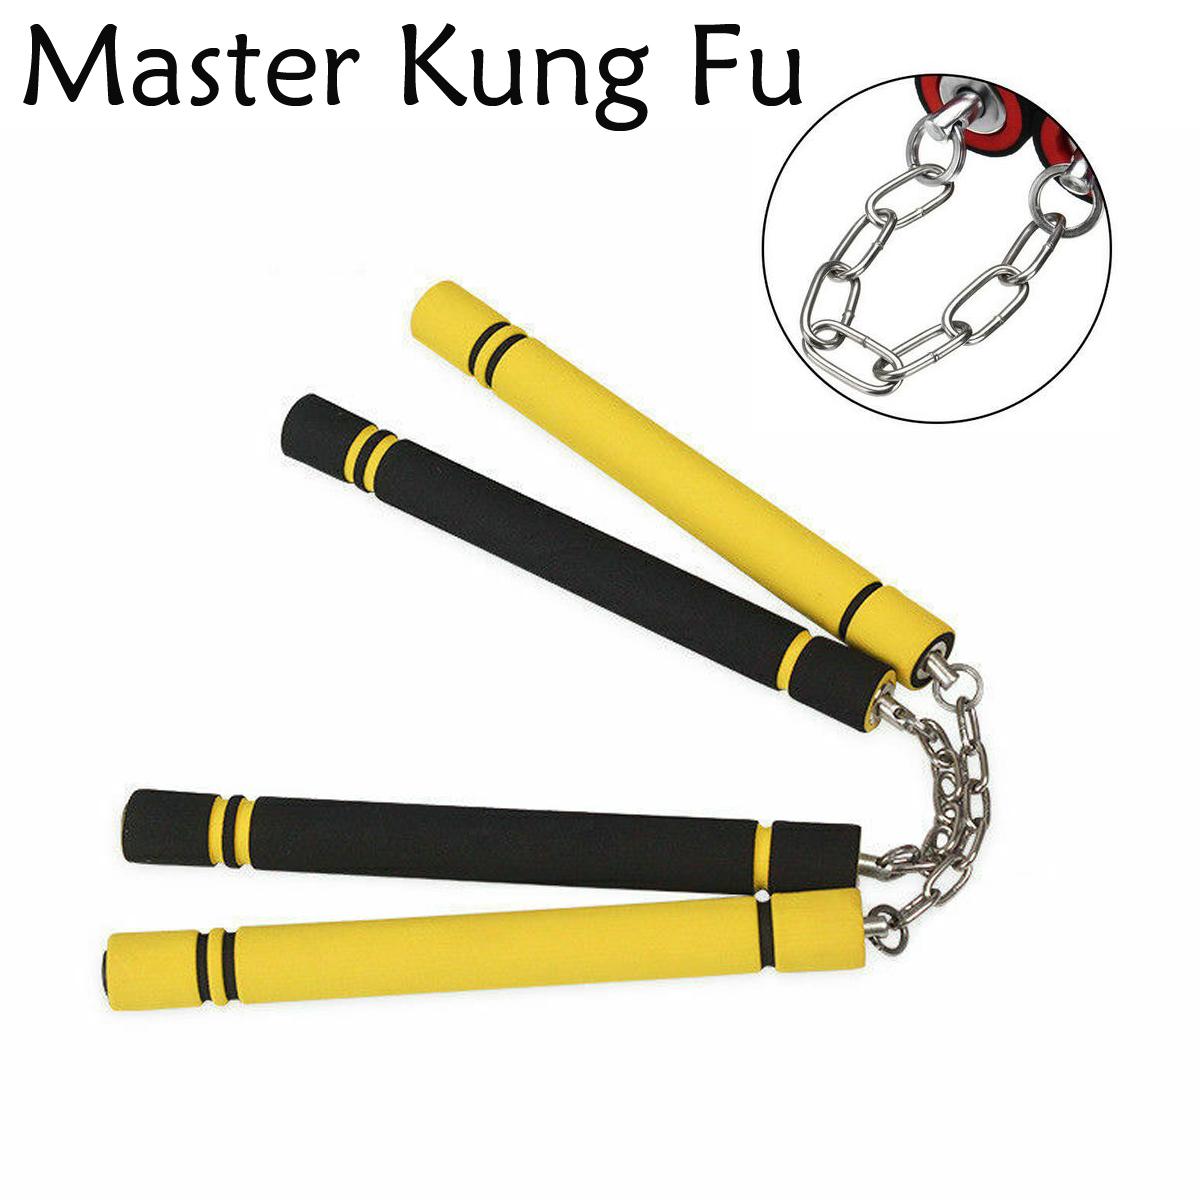 HOT Karate Martial Arts Training Foam Nunchaku Nunchucks Stick Practice Weapon